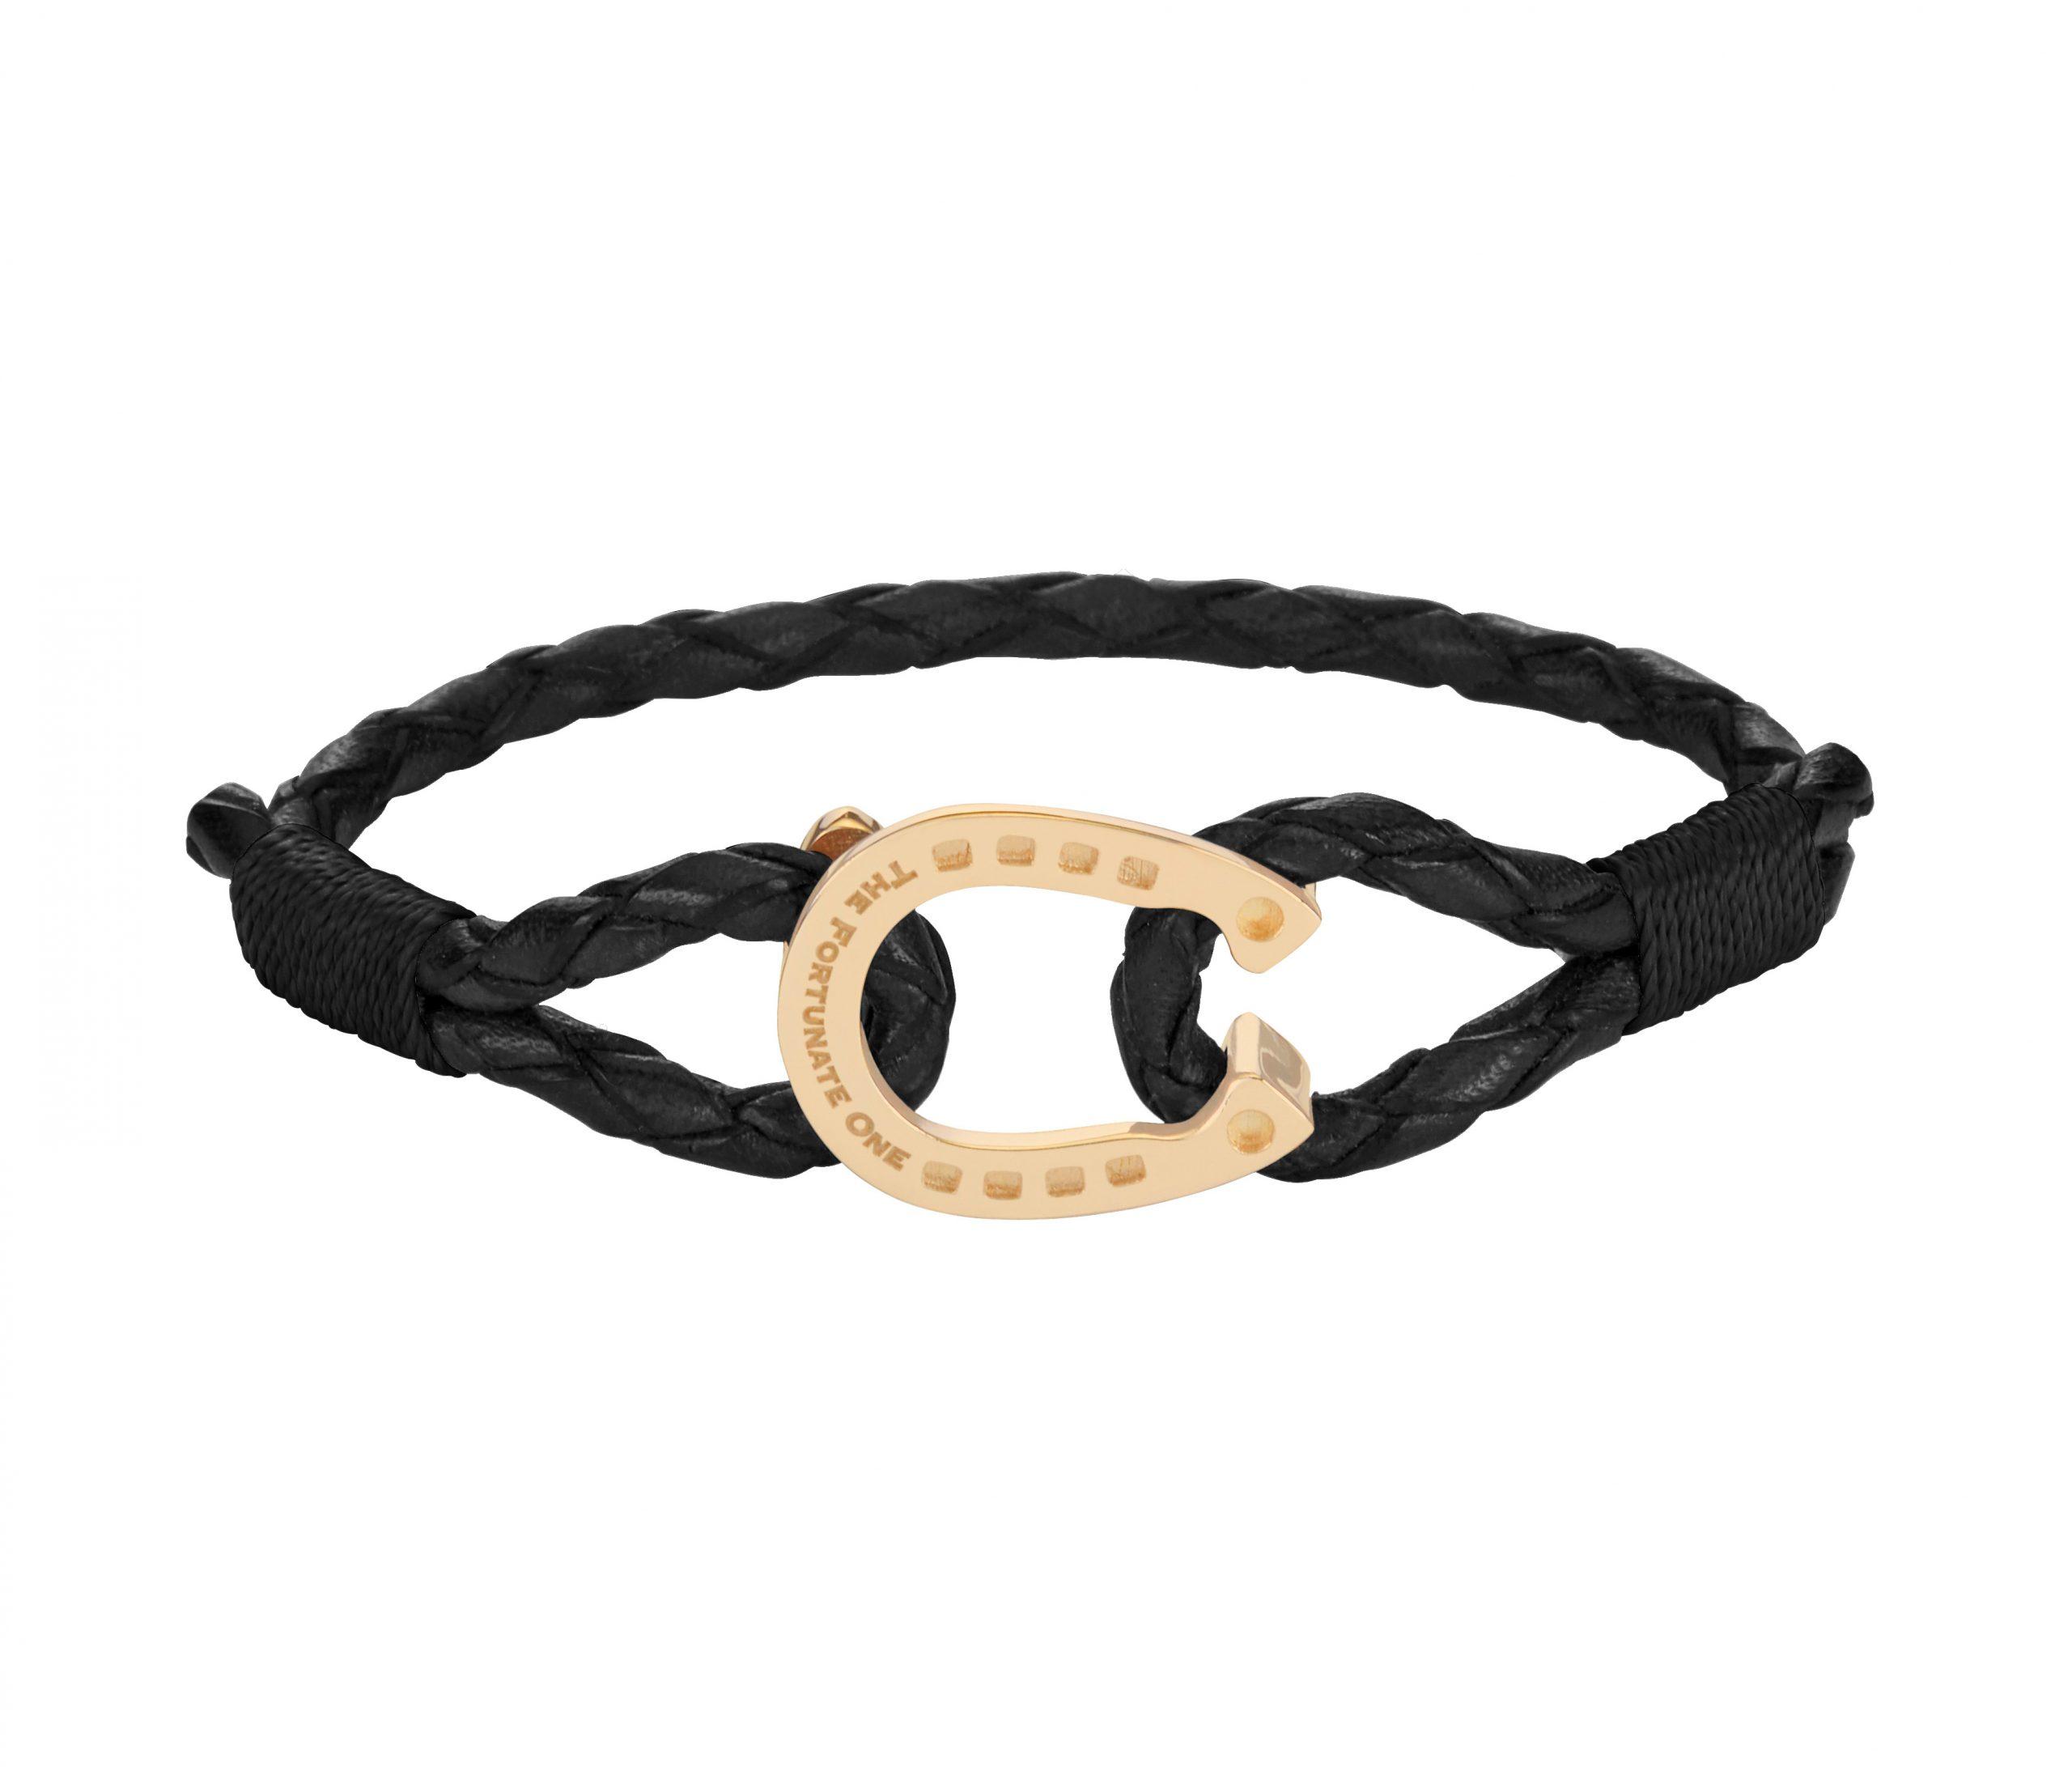 Horseshoe-Jewellery-Bracelet-Black-Gold-front